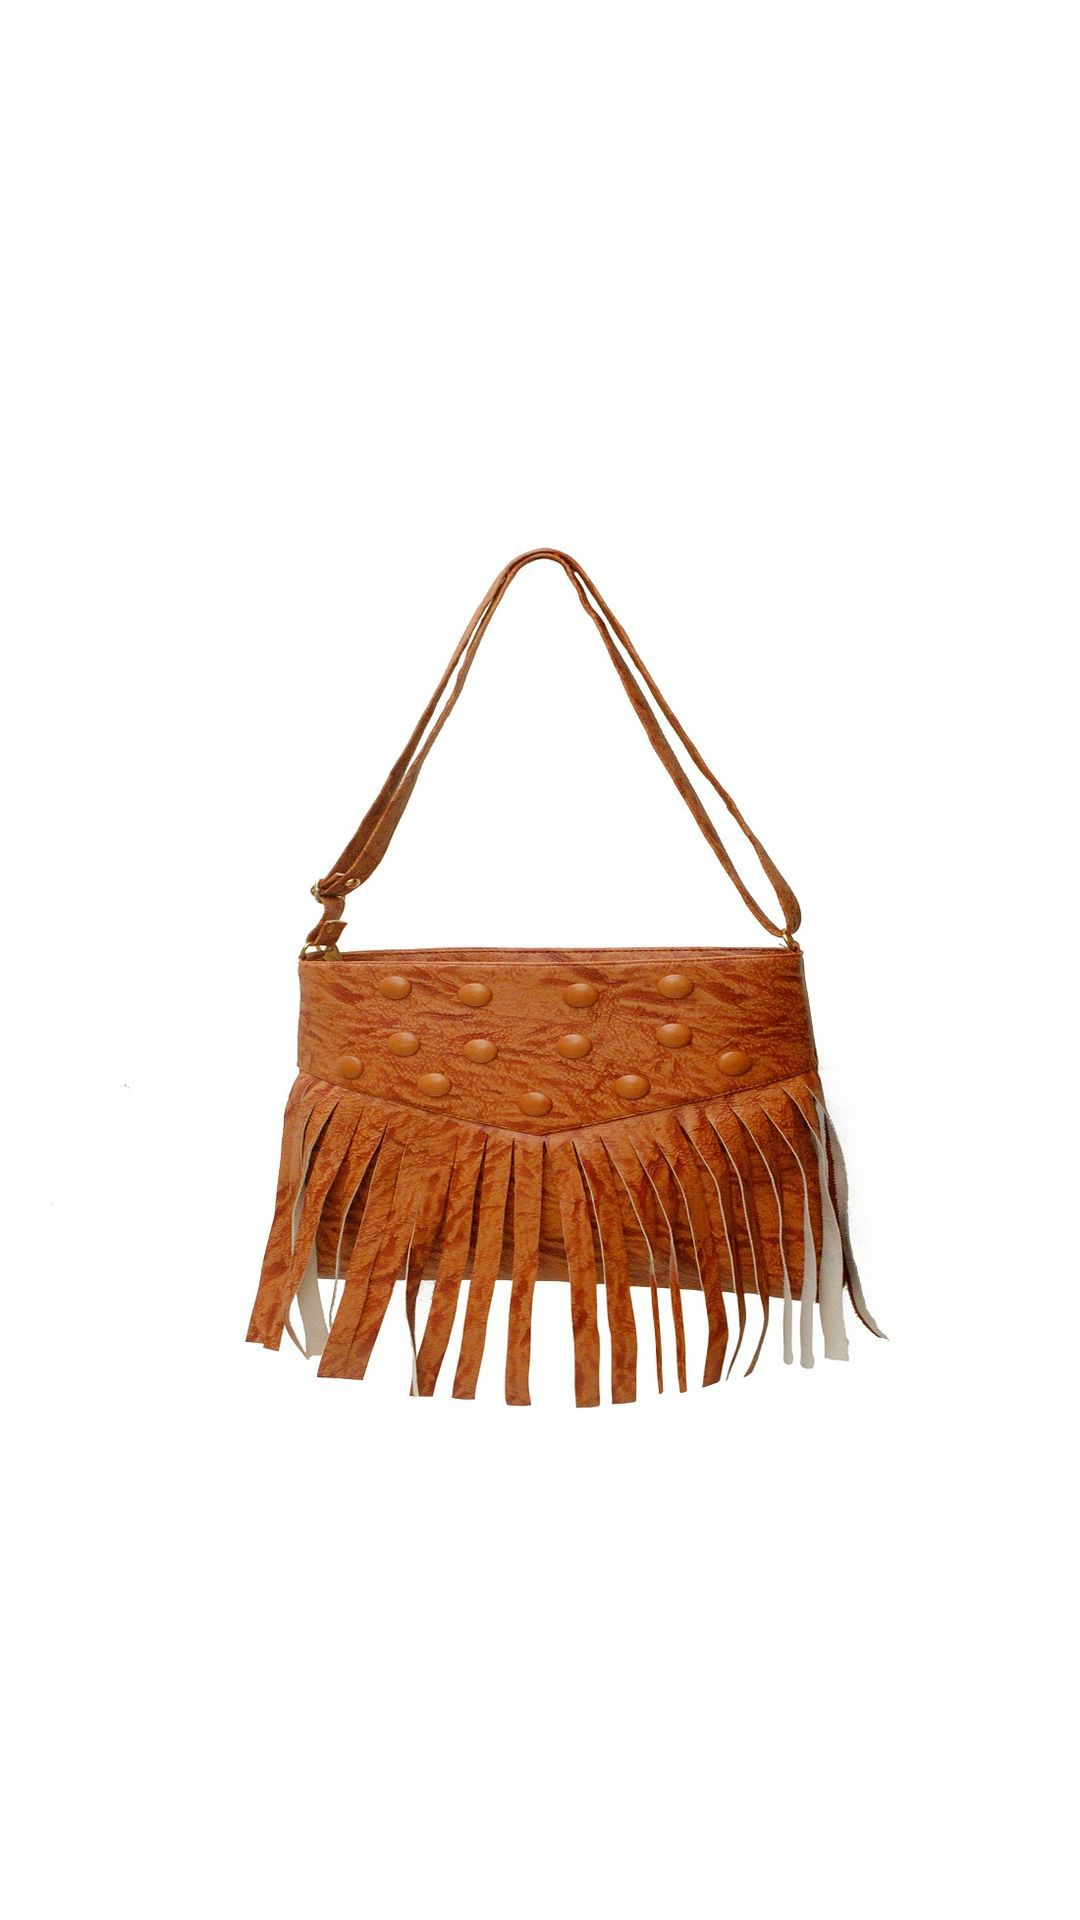 Varaj Golden Brown P.U. Handbags Accessories